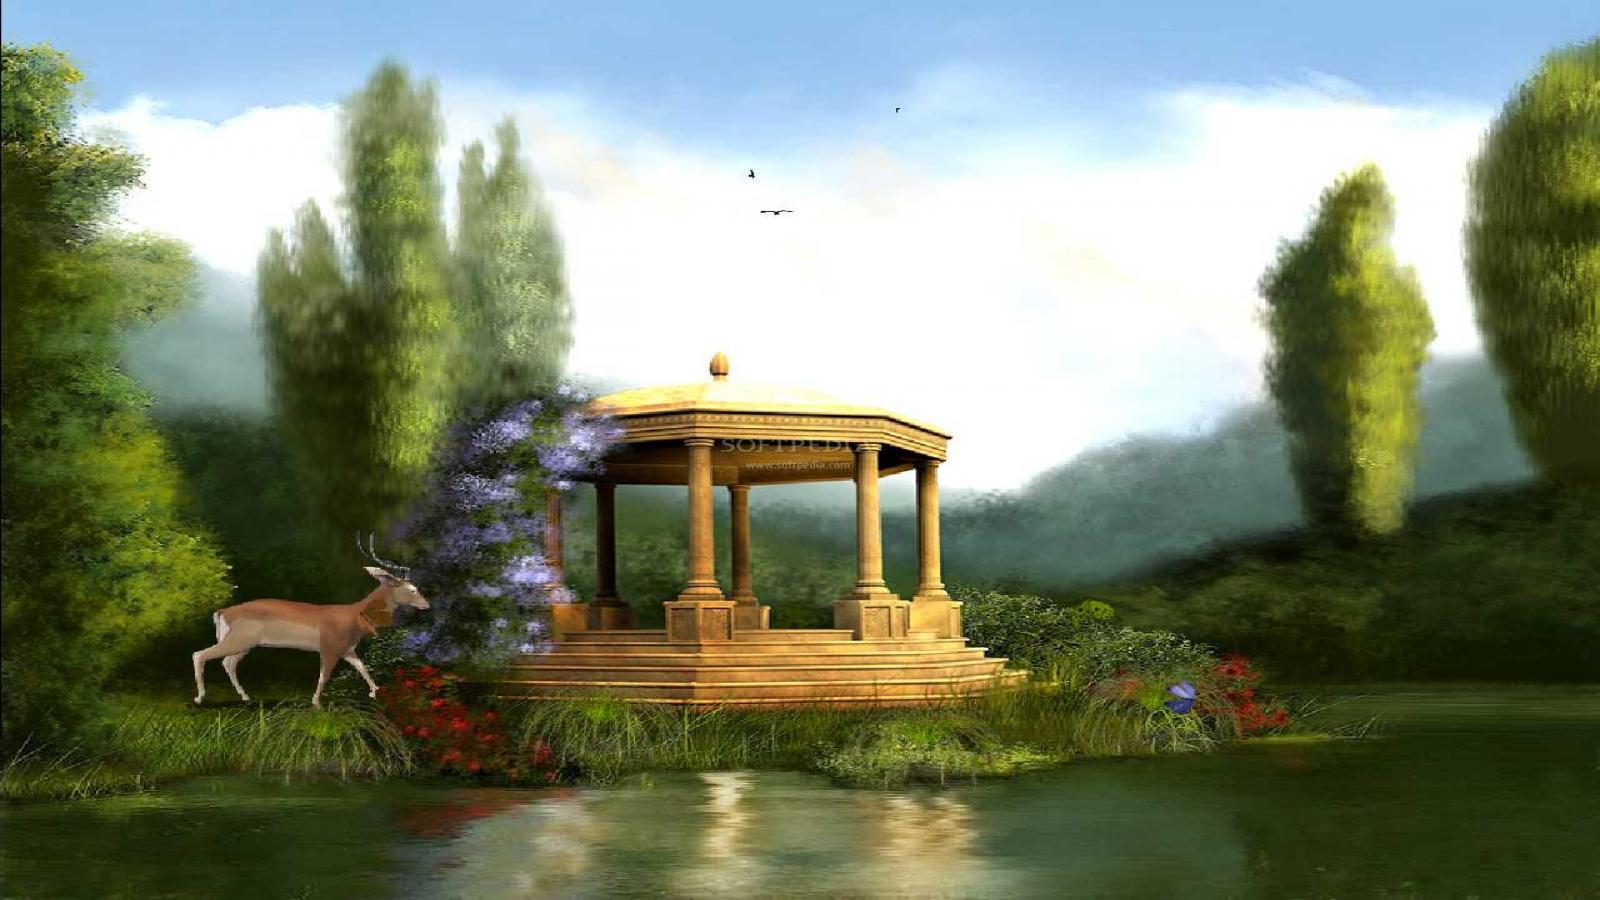 1600x900 px] Black Swan Lake Animated Screensaver Wallpaper 1600x900